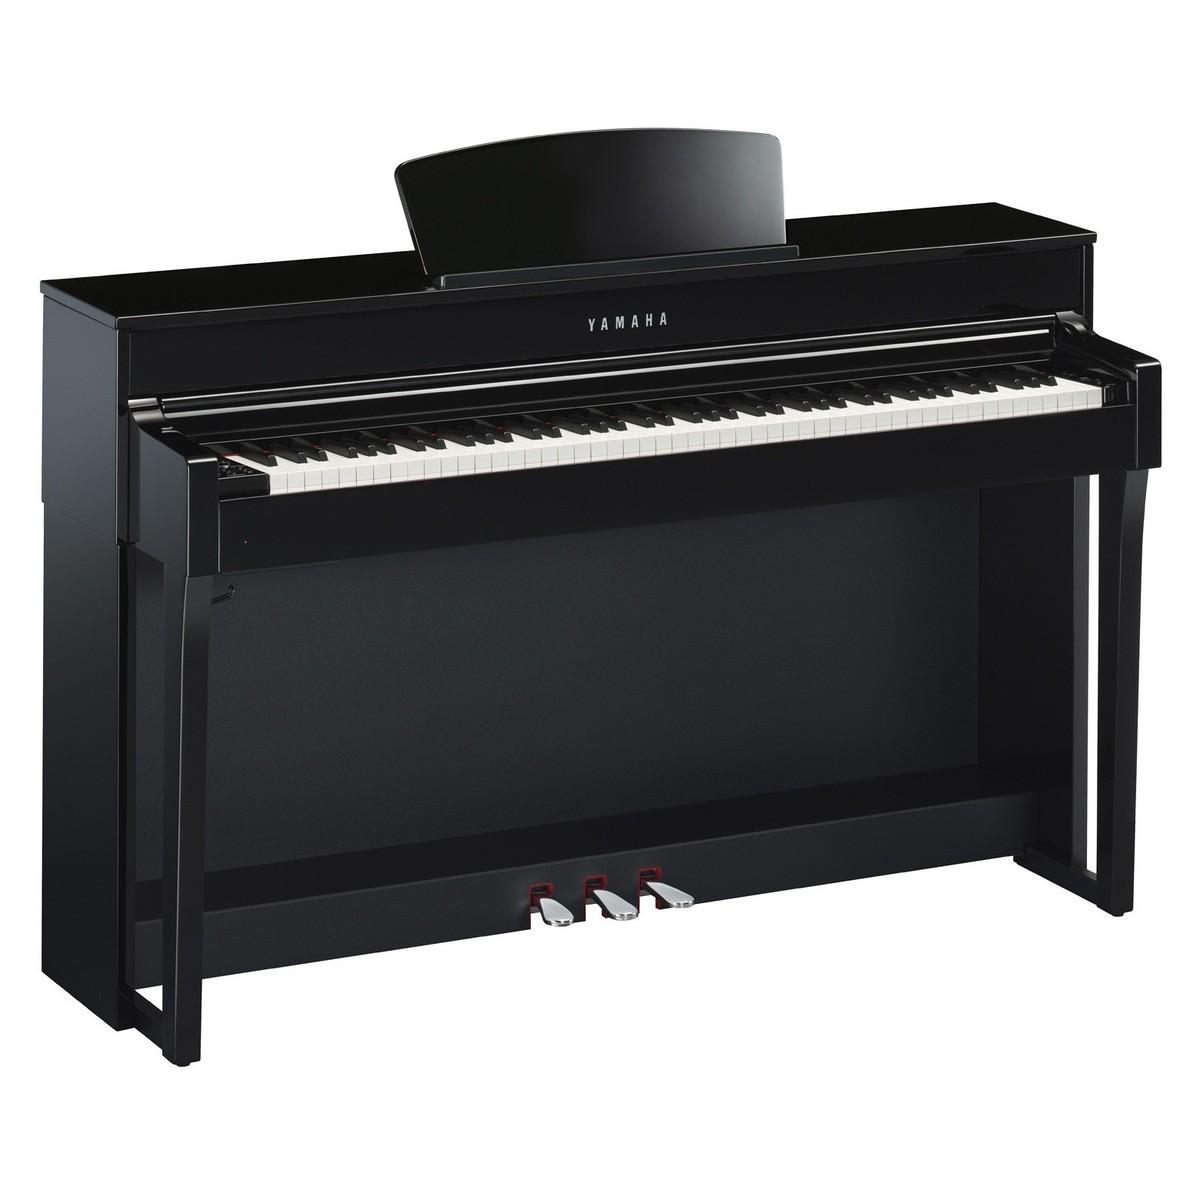 yamaha clp 635 digital piano polished ebony at gear4music. Black Bedroom Furniture Sets. Home Design Ideas